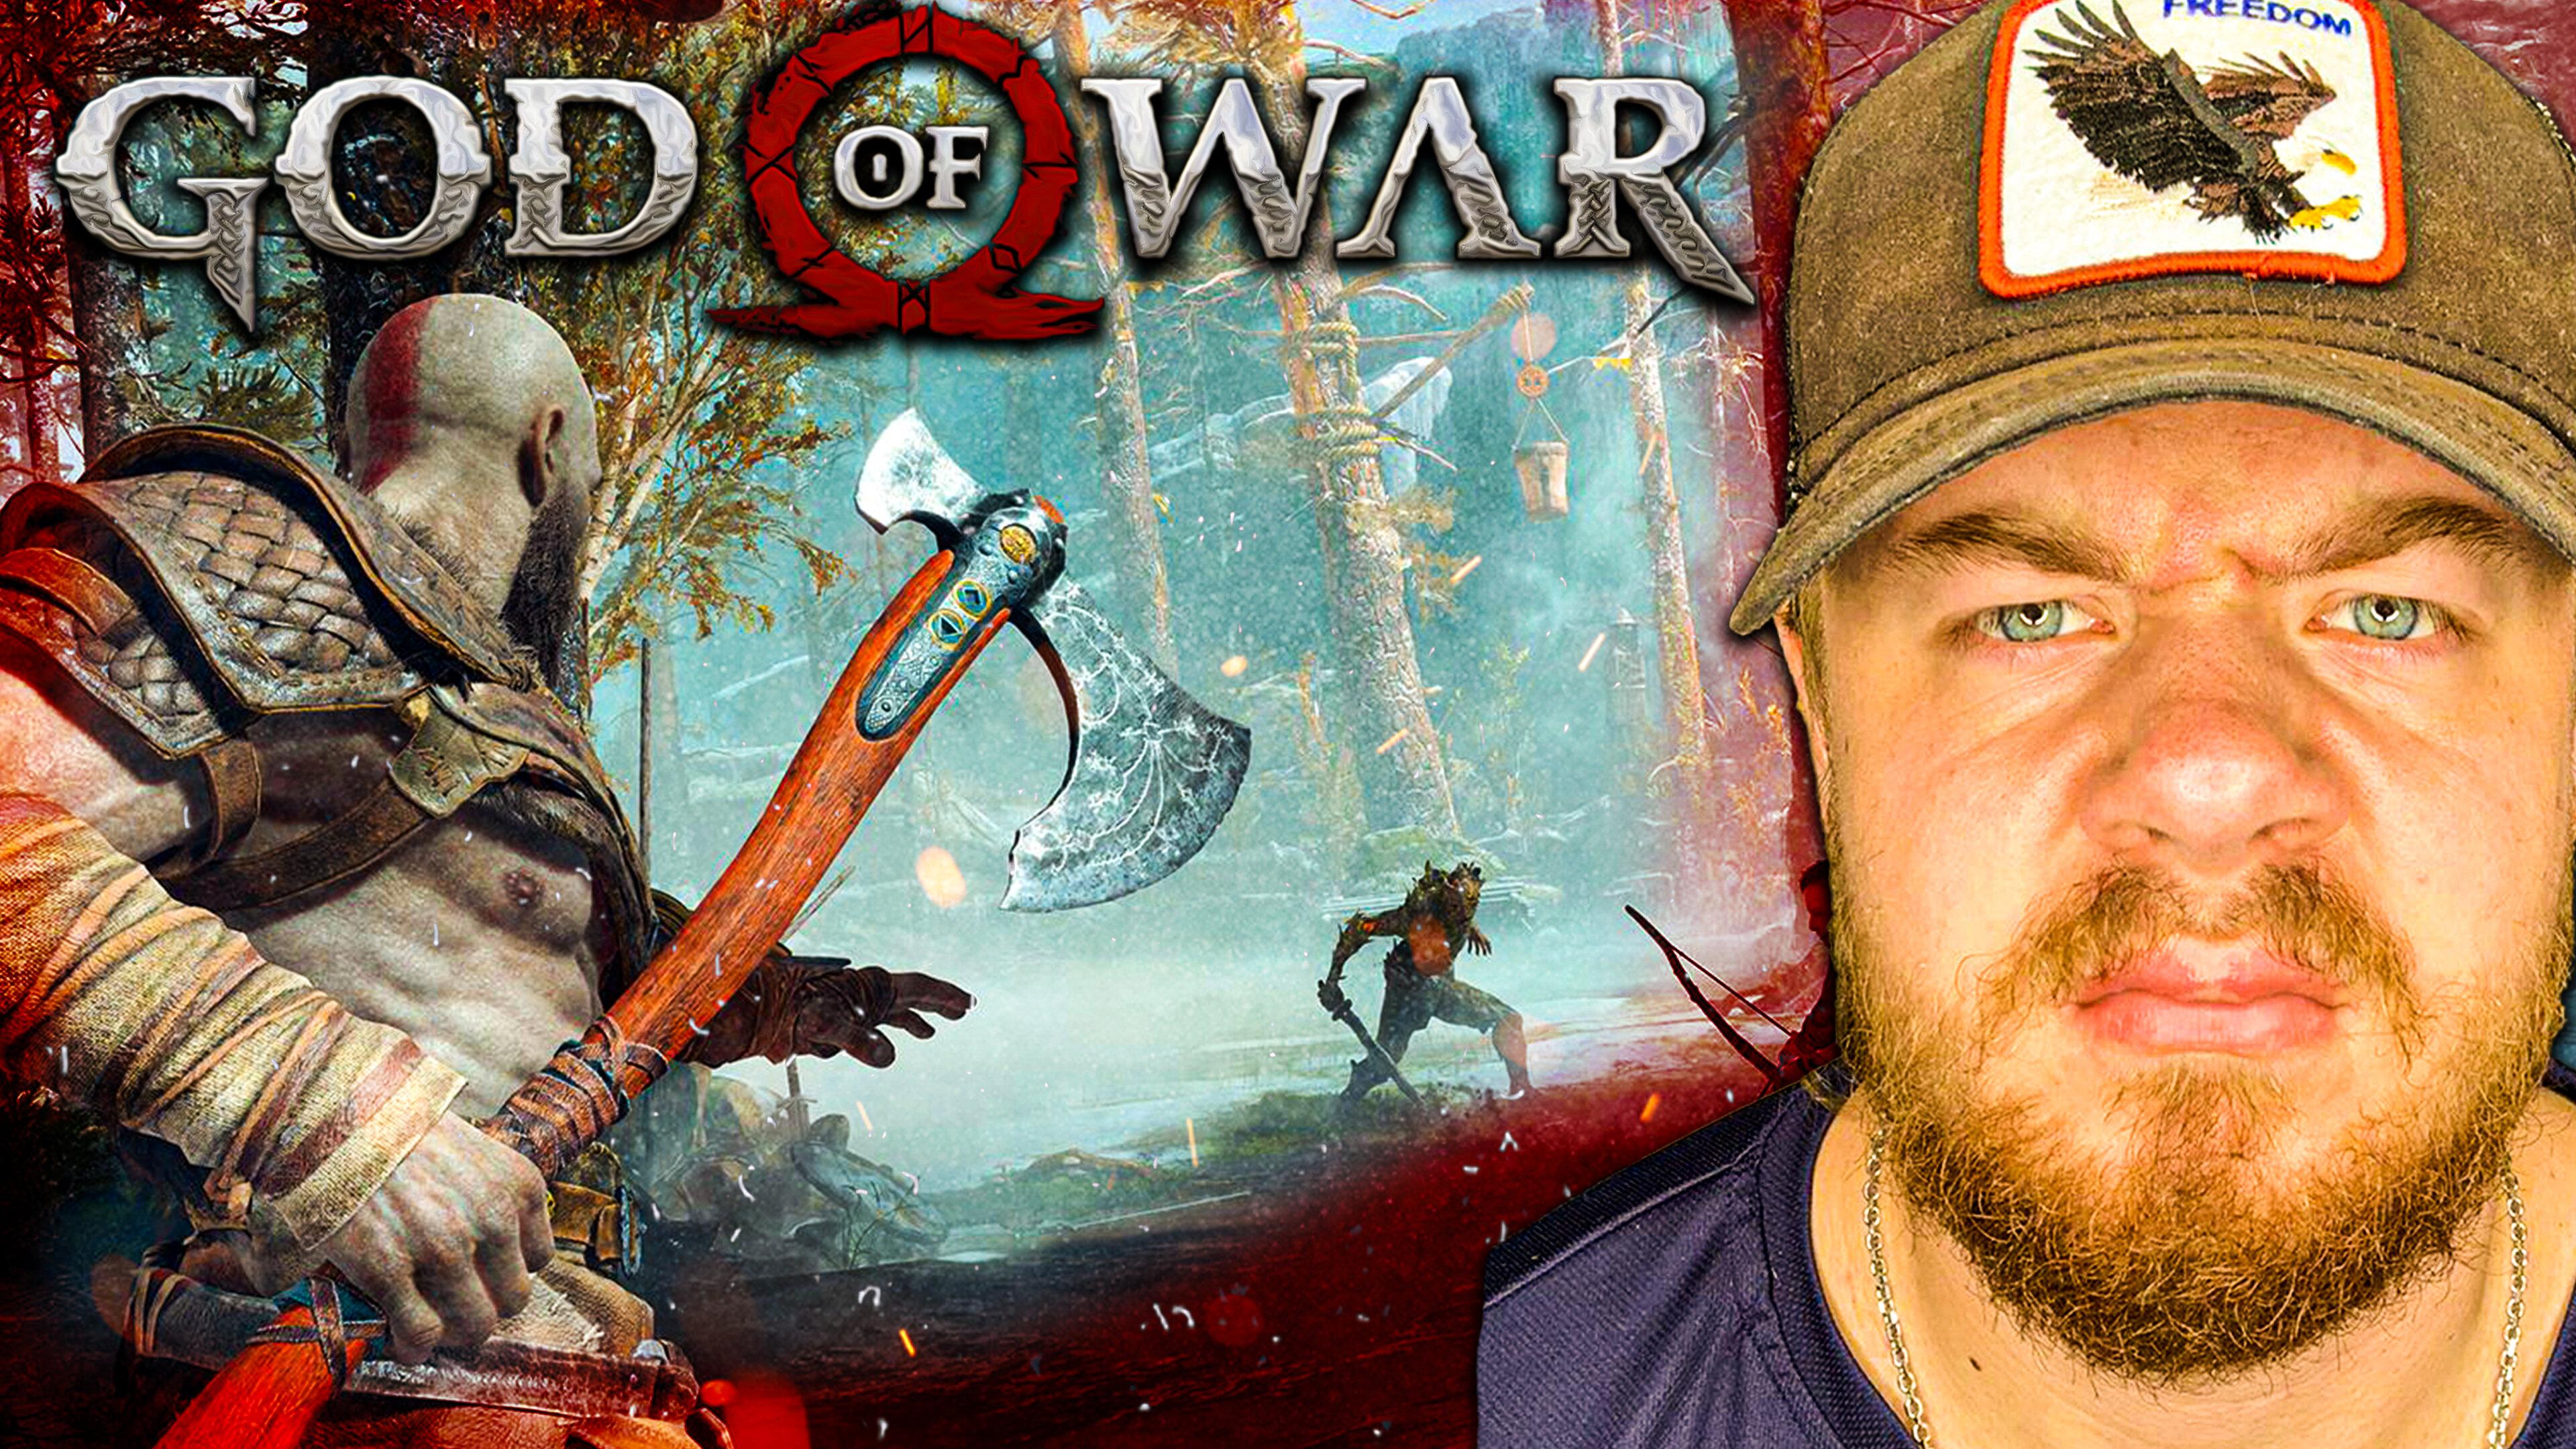 Jimbo's God of War